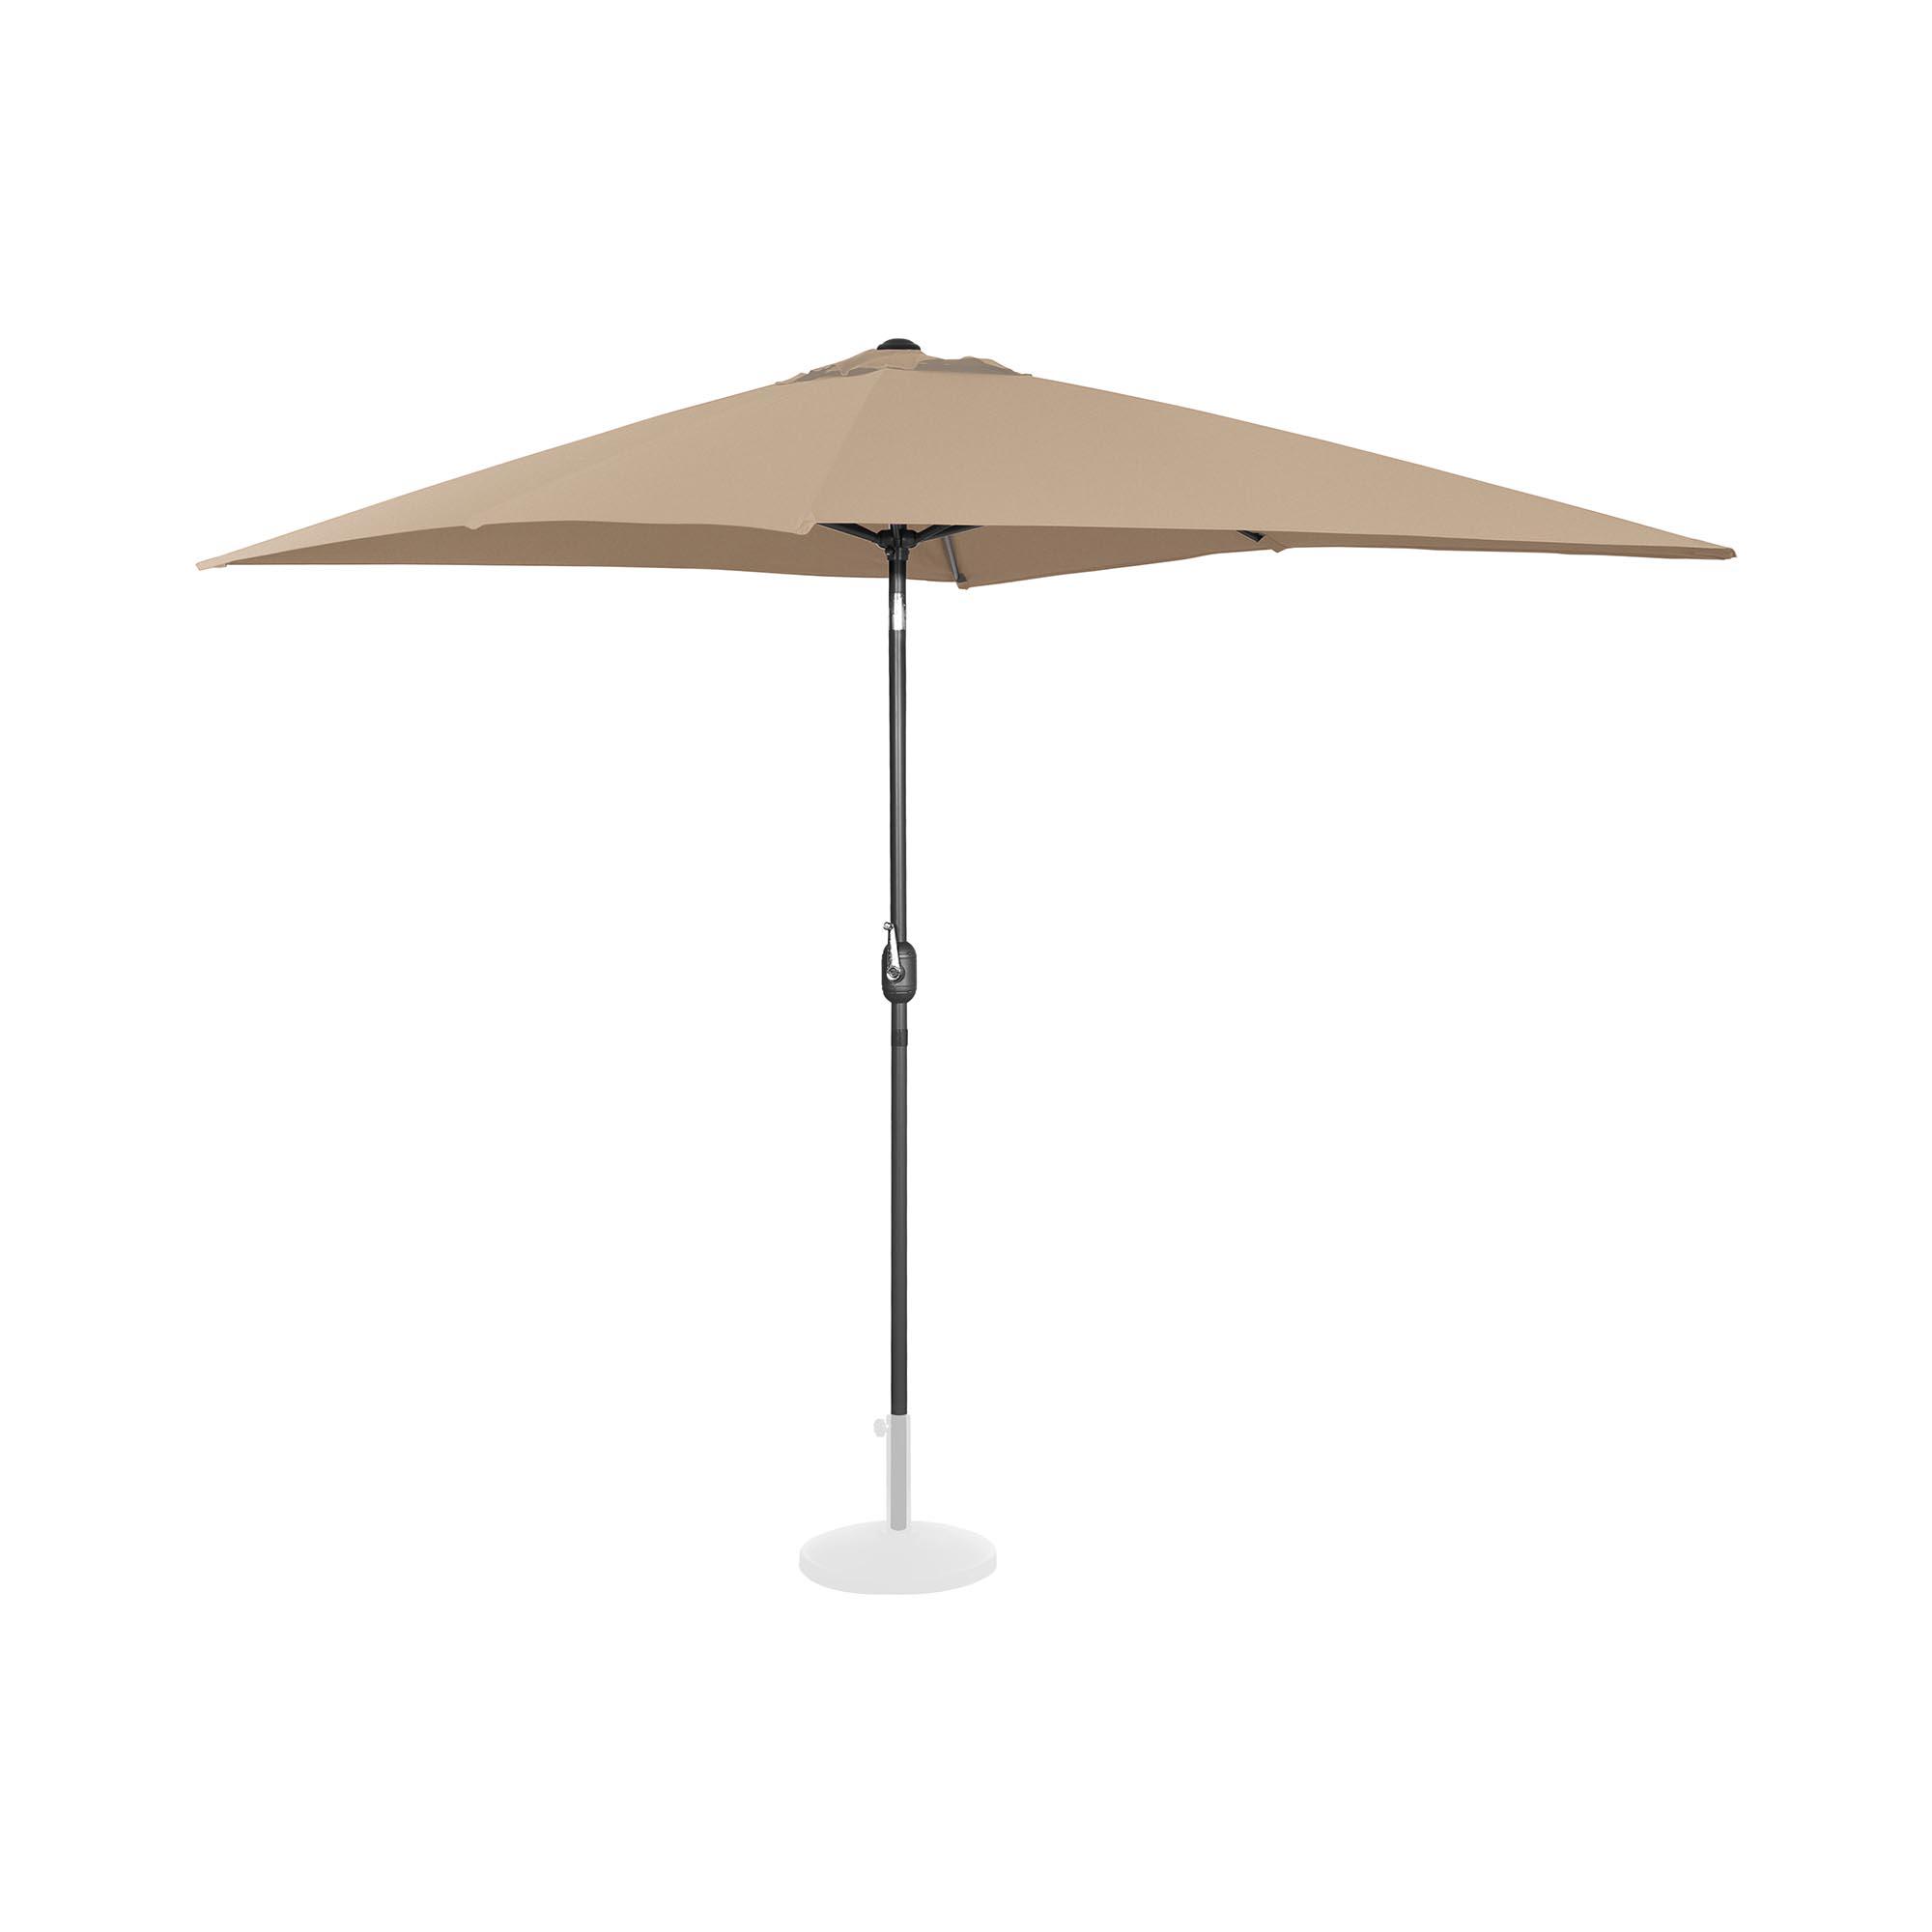 Uniprodo Sonnenschirm groß - taupe - rechteckig - 200 x 300 cm - neigbar 10250132